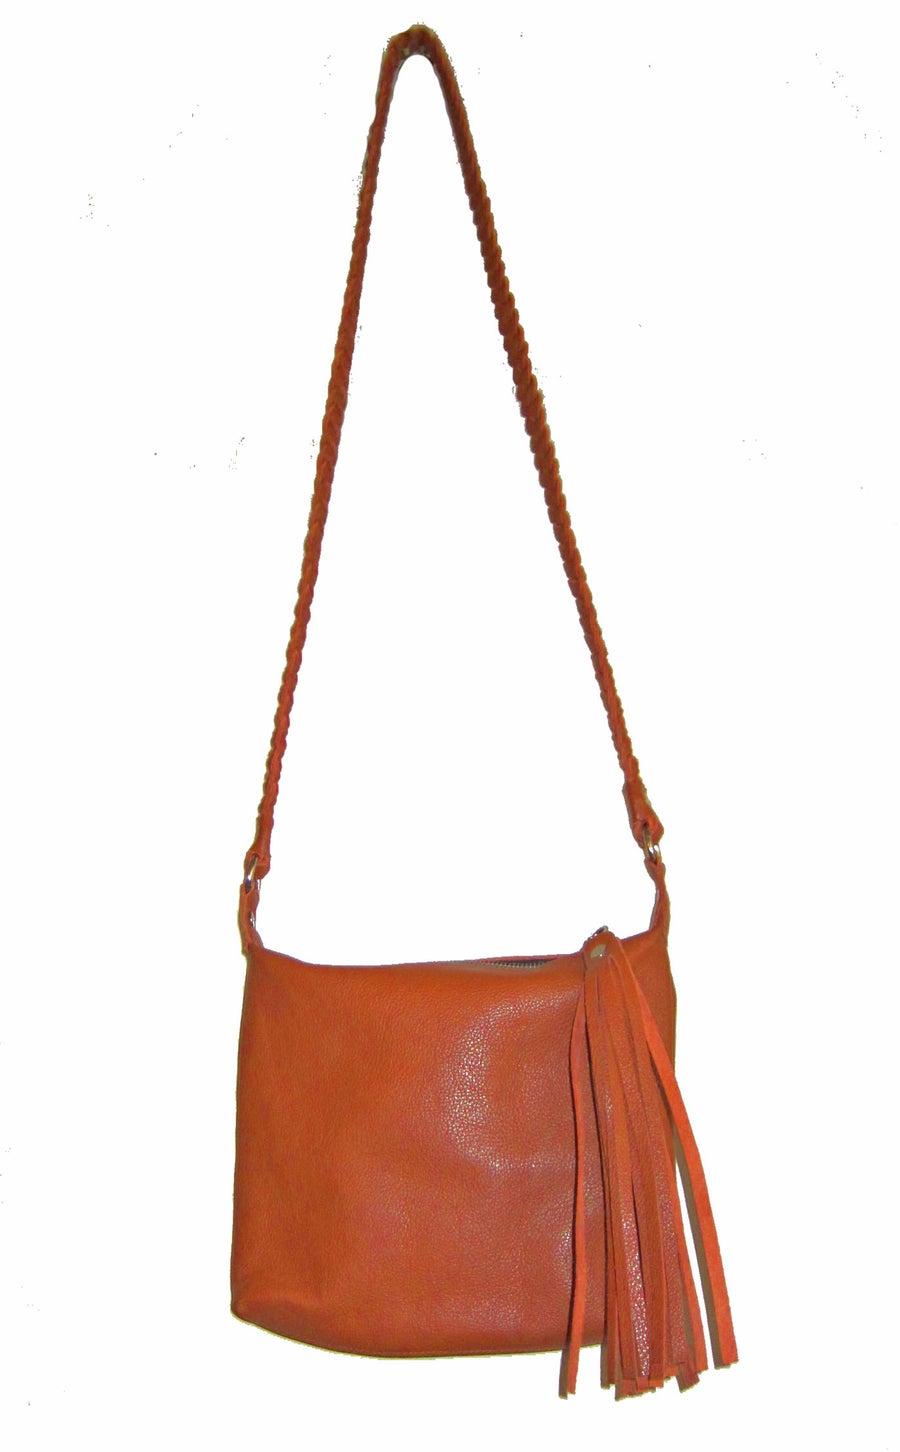 Image of Petty Cross-body bag